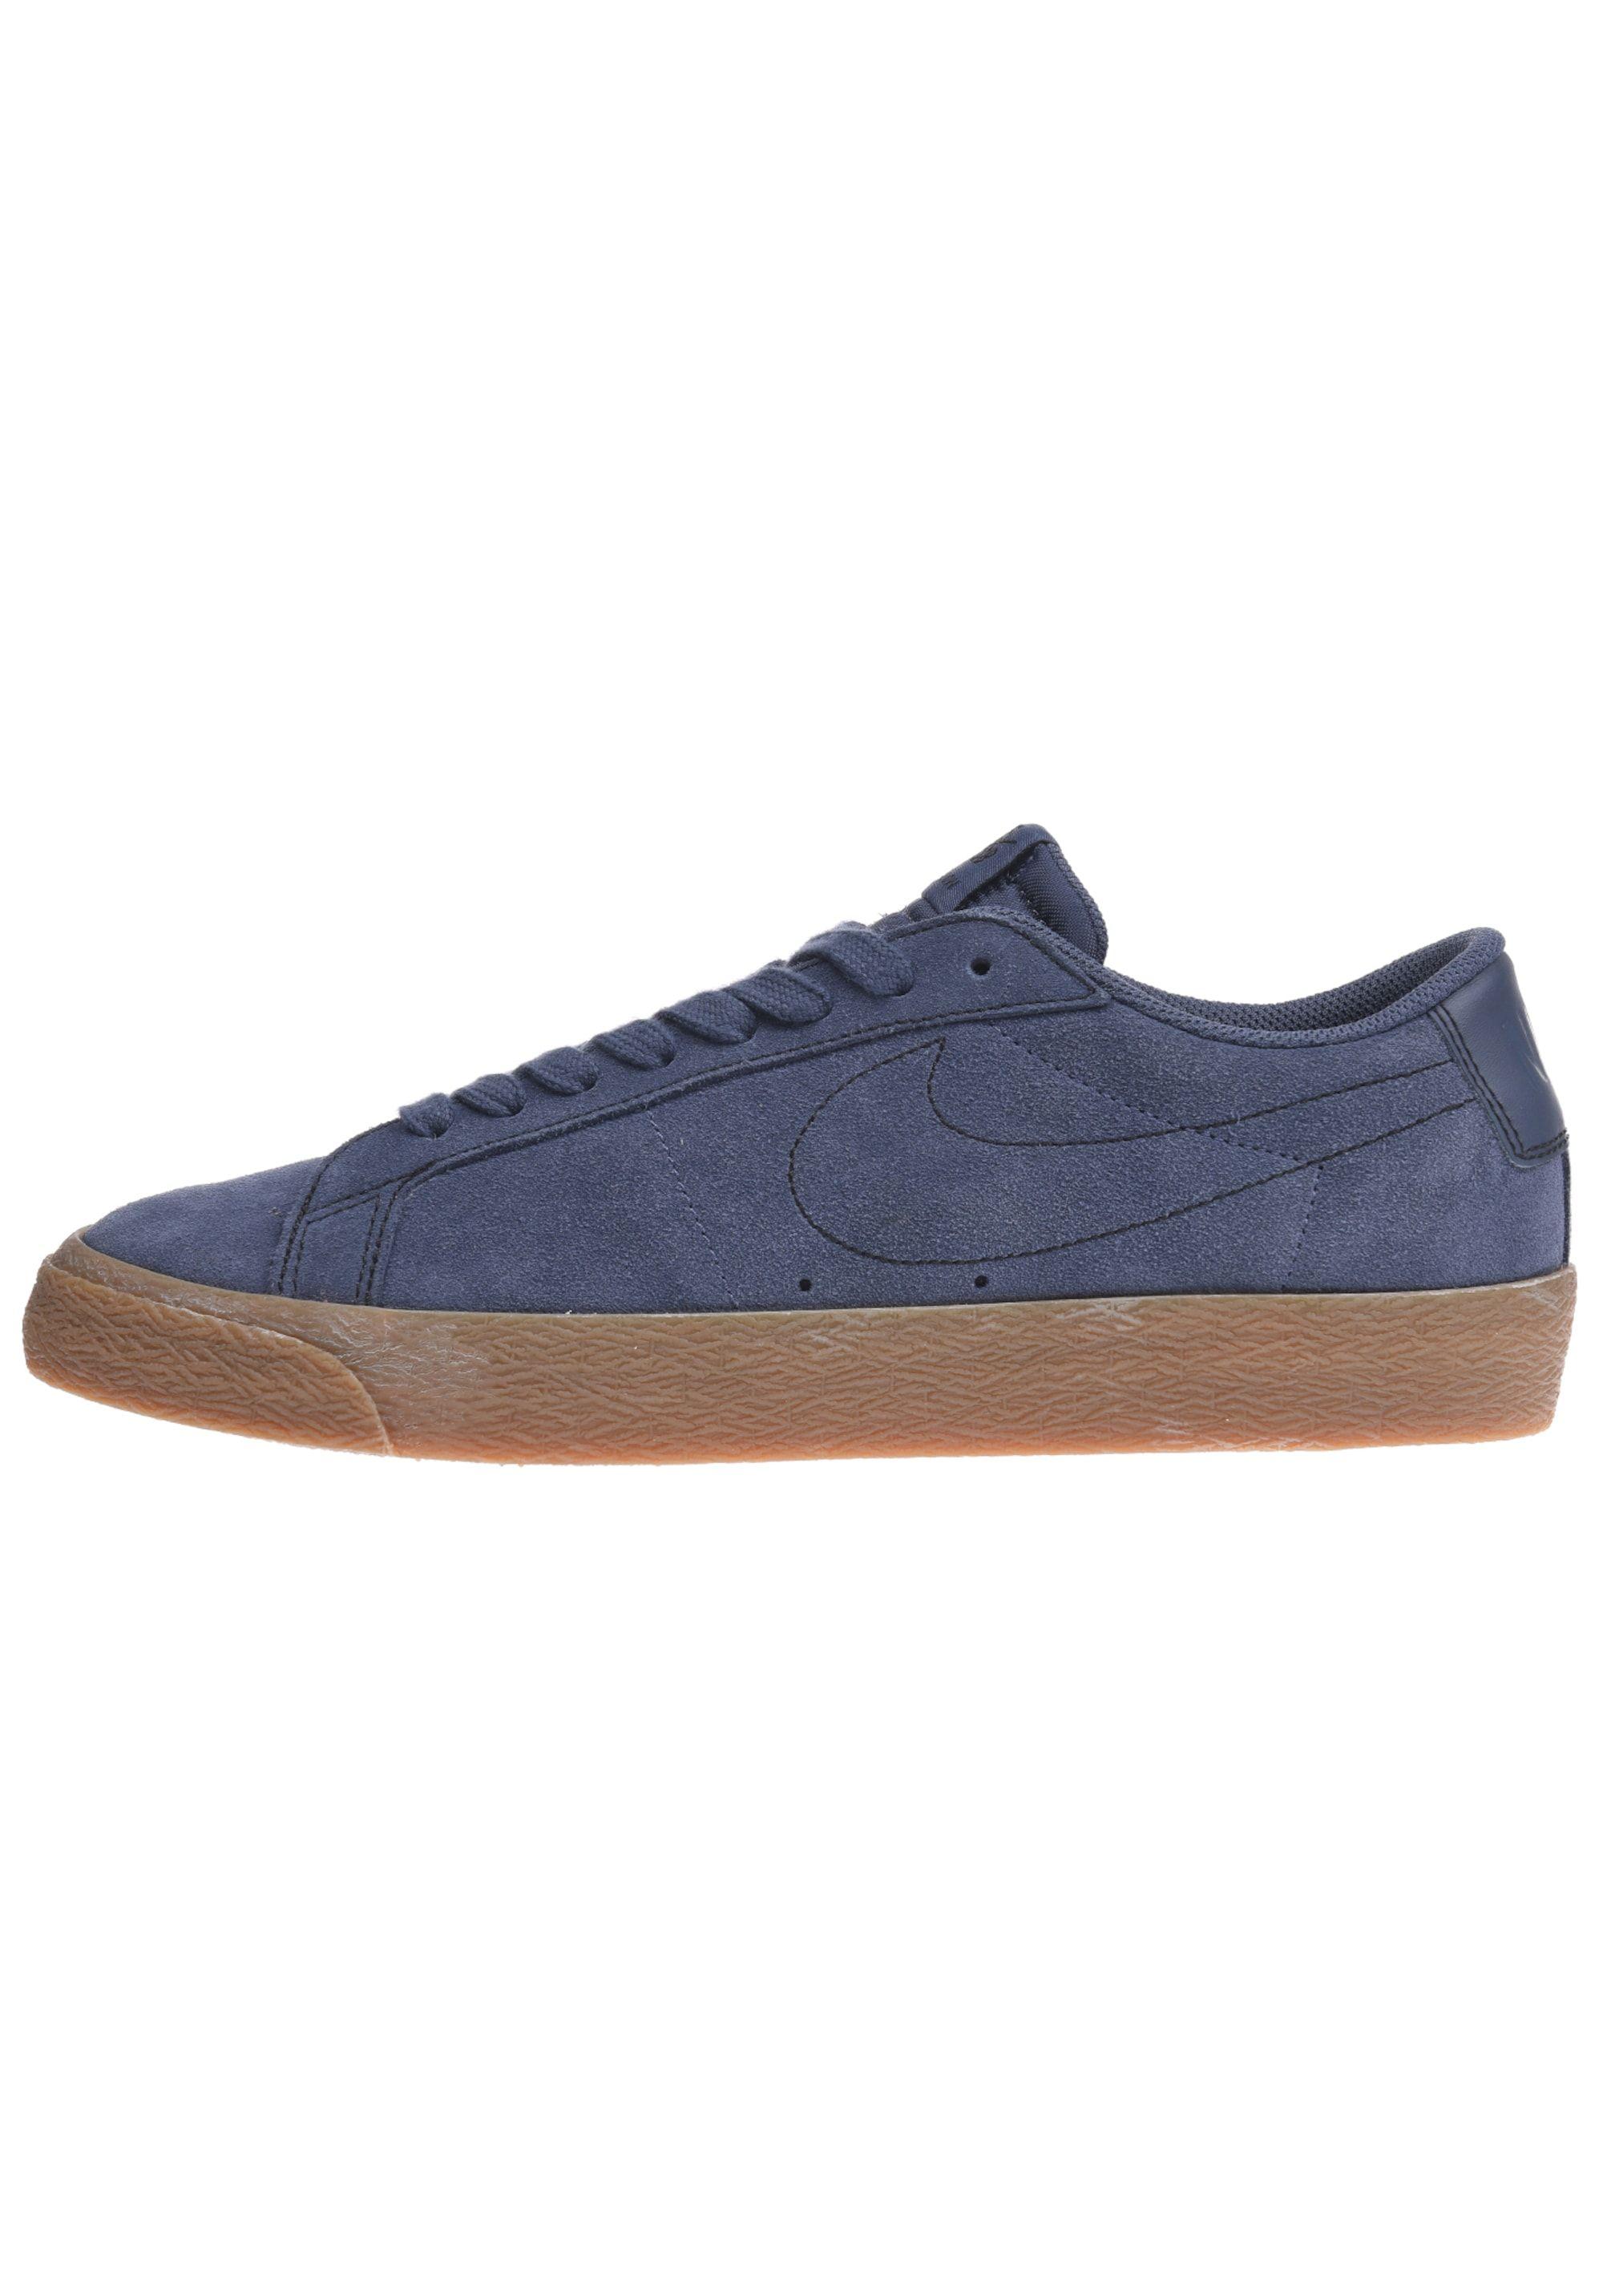 Low blau00888411185000 Herren Blazer NIKE Sneaker Zoom FlJTc51uK3